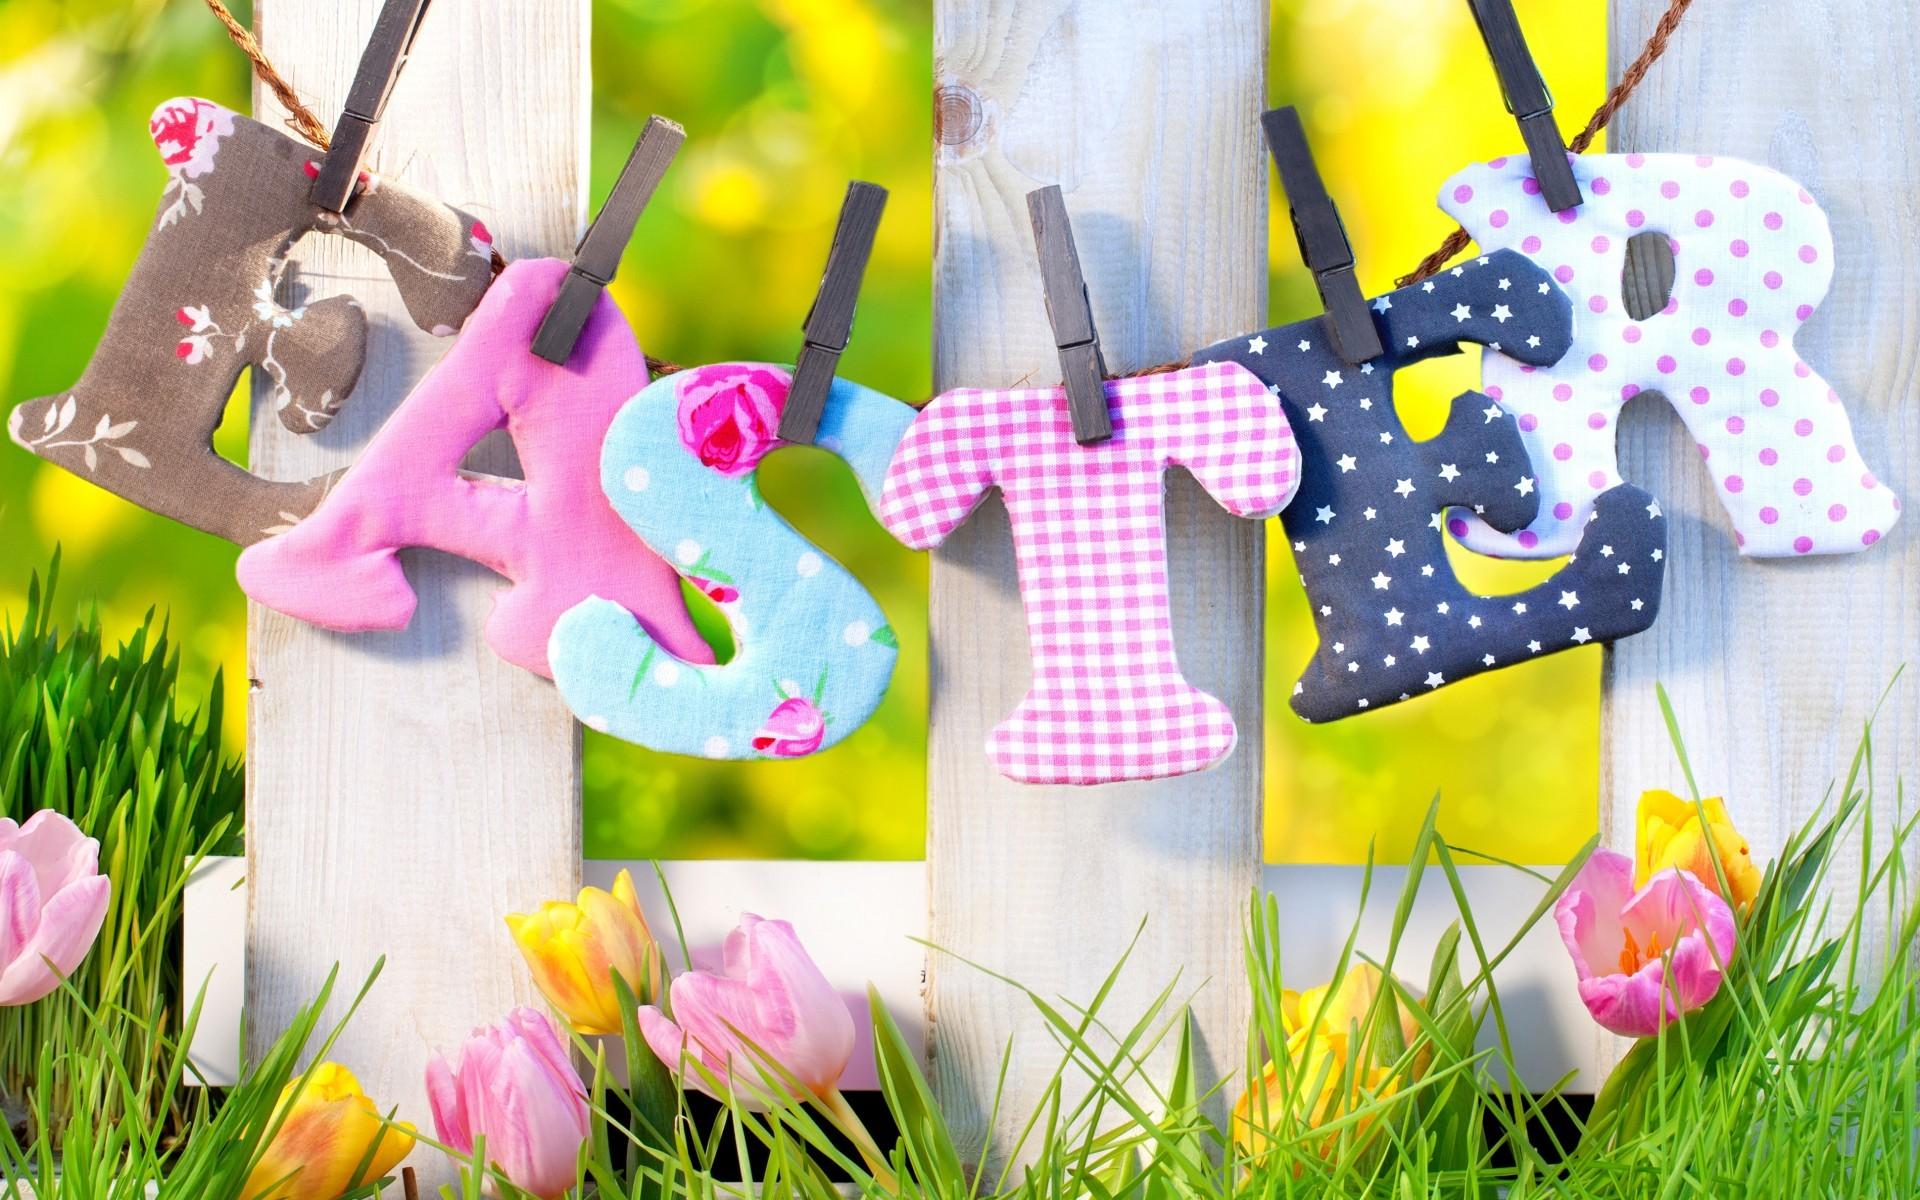 Easter background wallpaper